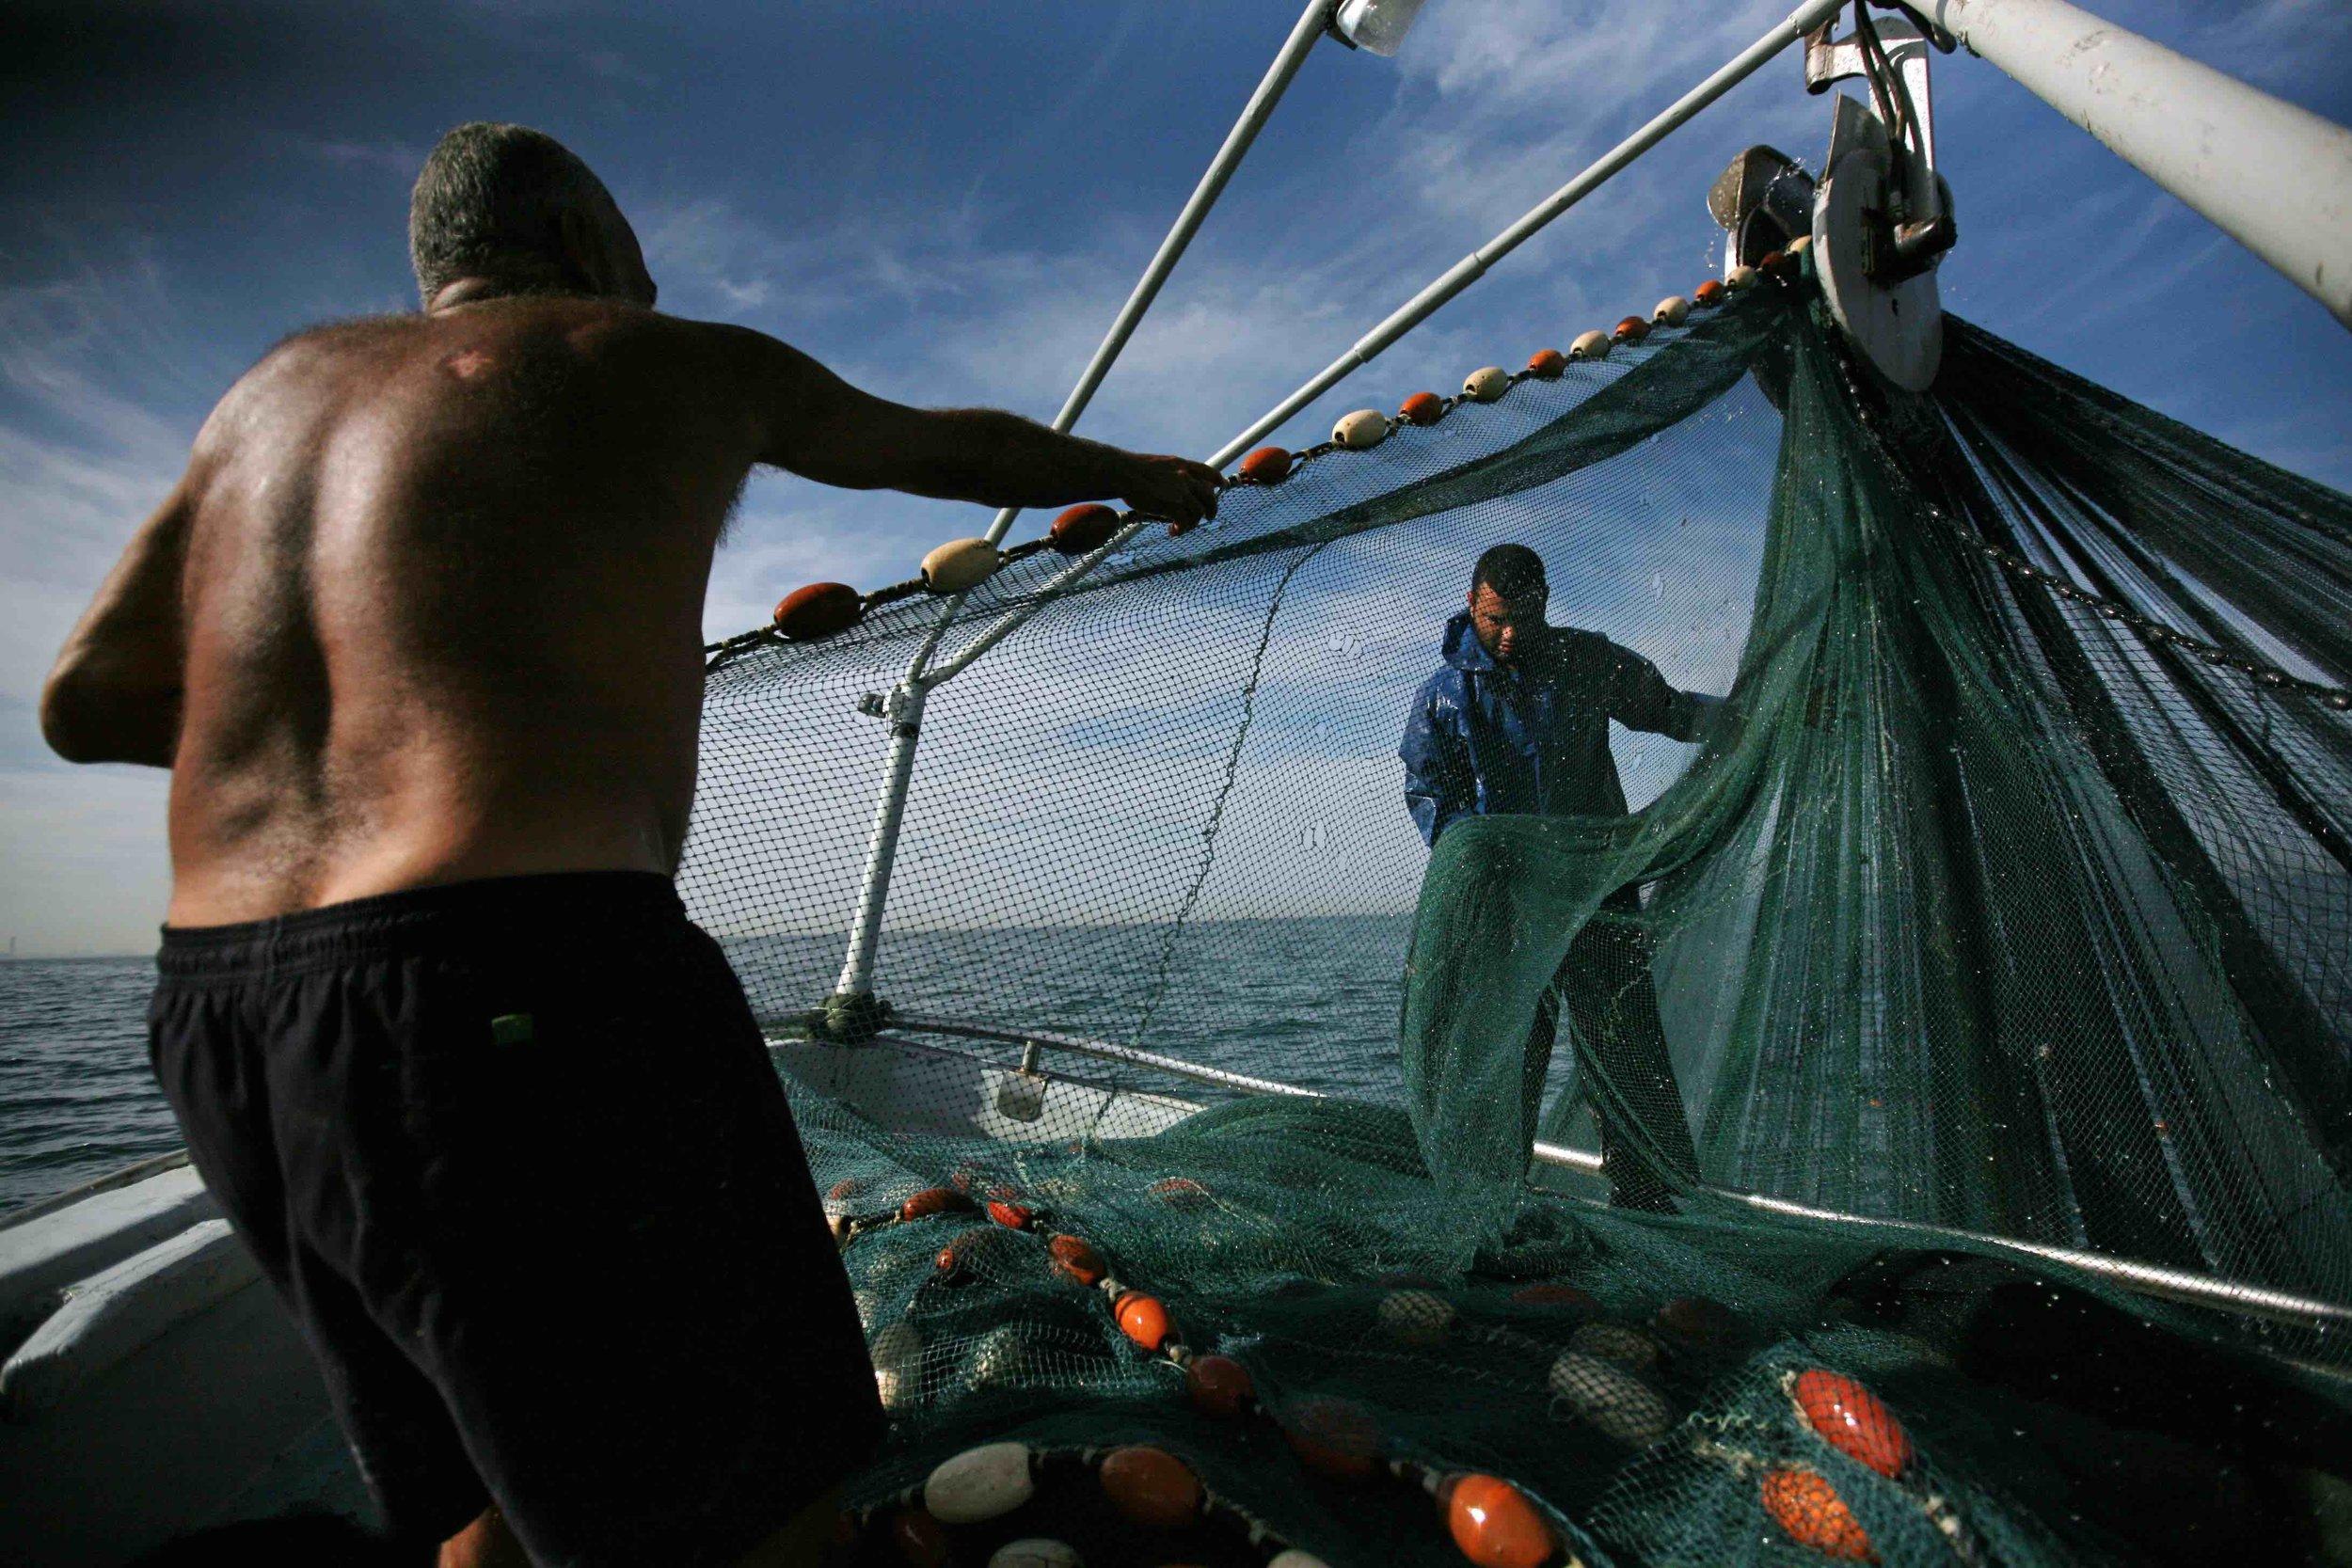 Fisherman working / Israel 2010